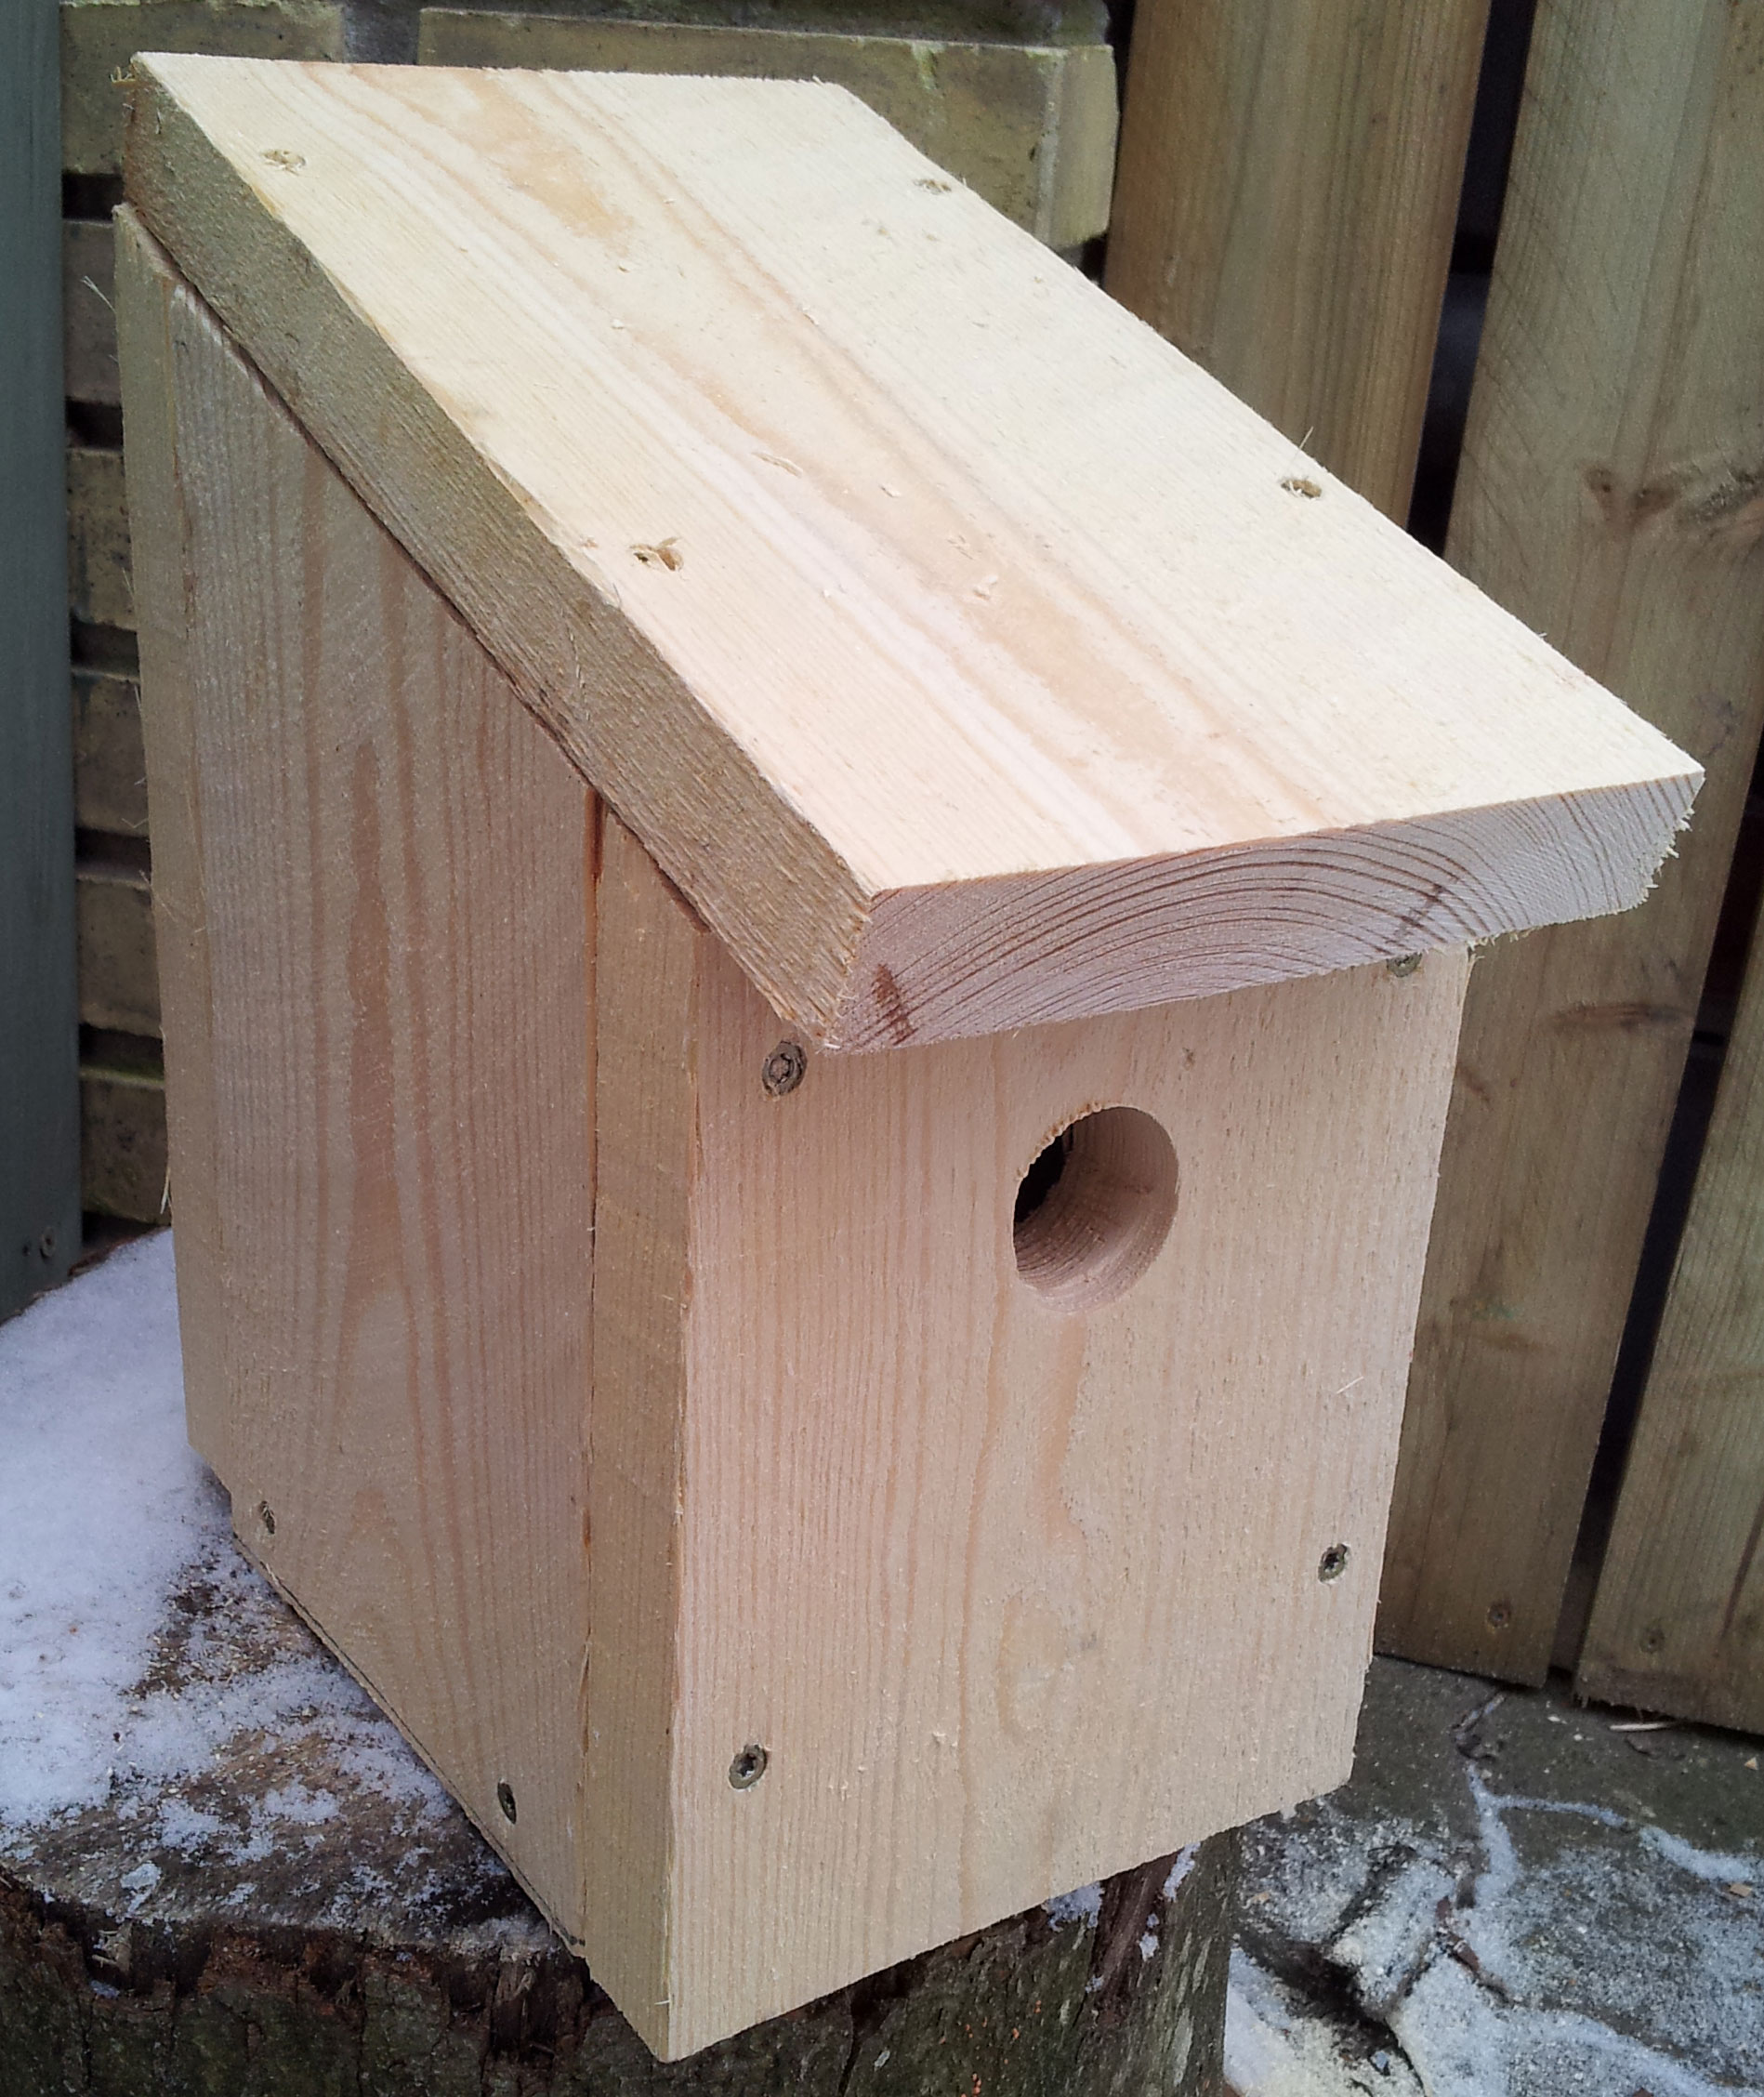 fuglekasse-klar-til-brug